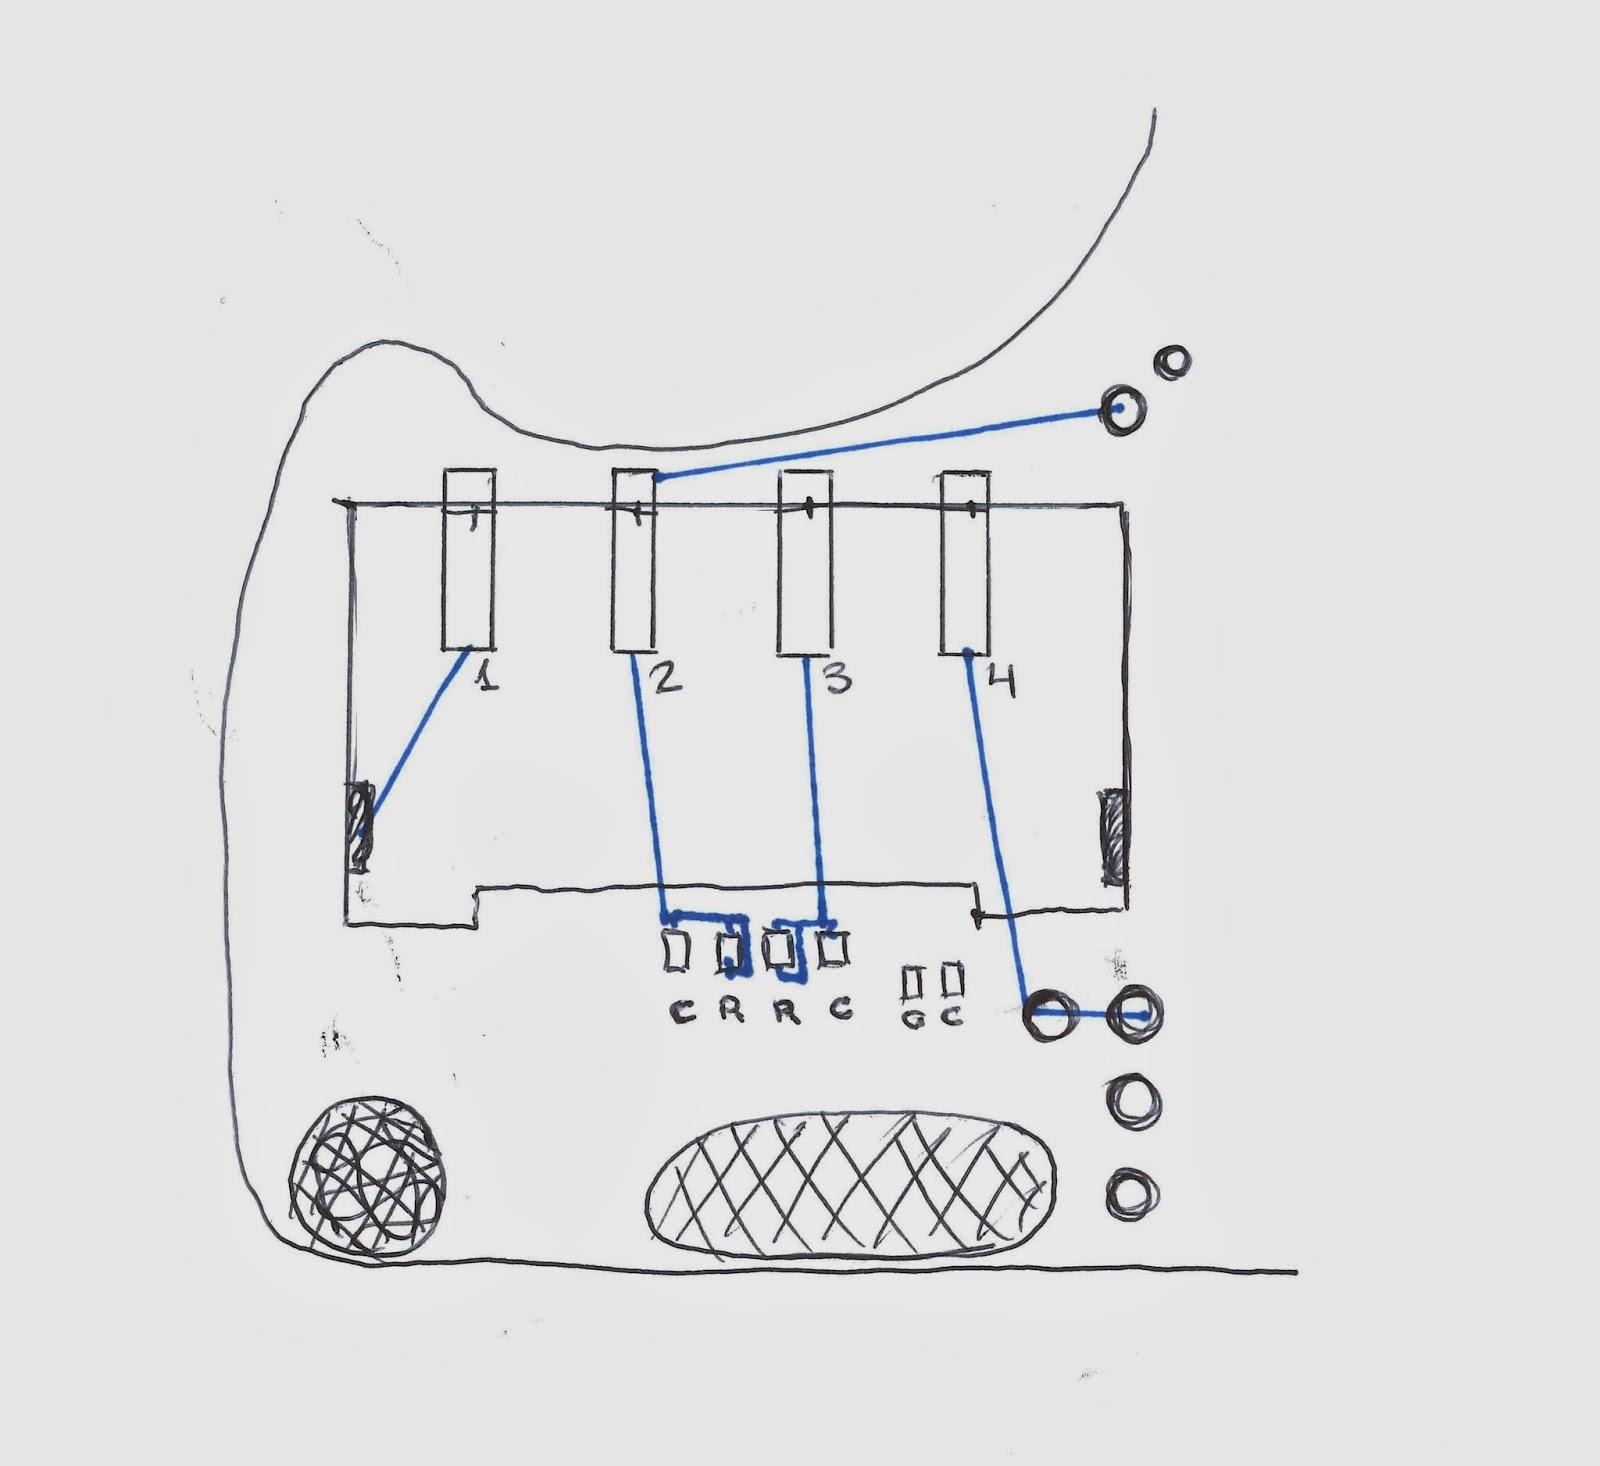 Soluciones Tecnicas Esquema Conector Bateria Iphone 4s